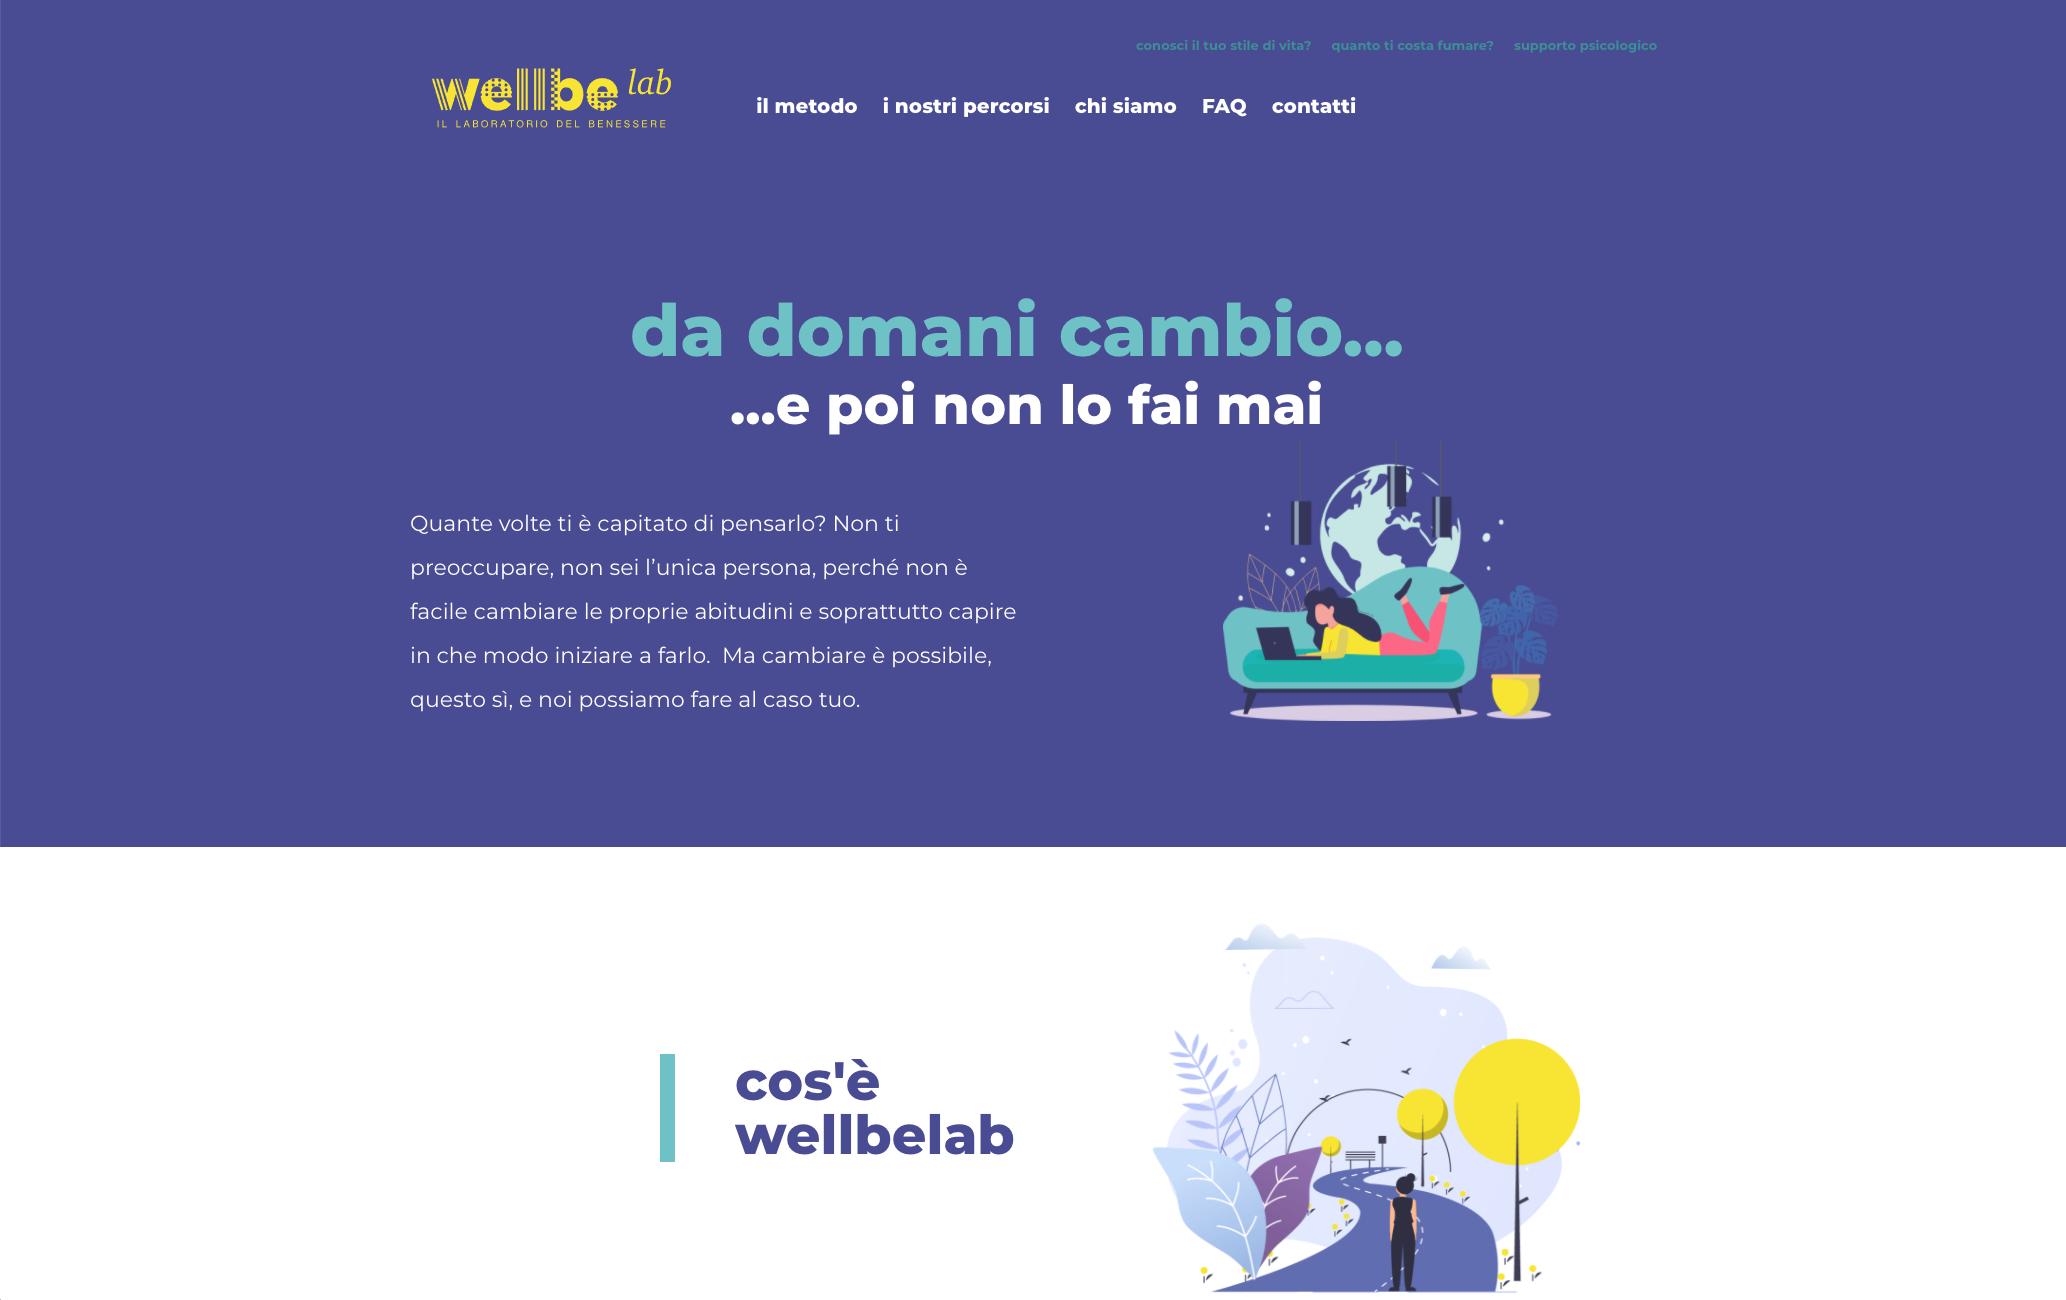 Wellbelab